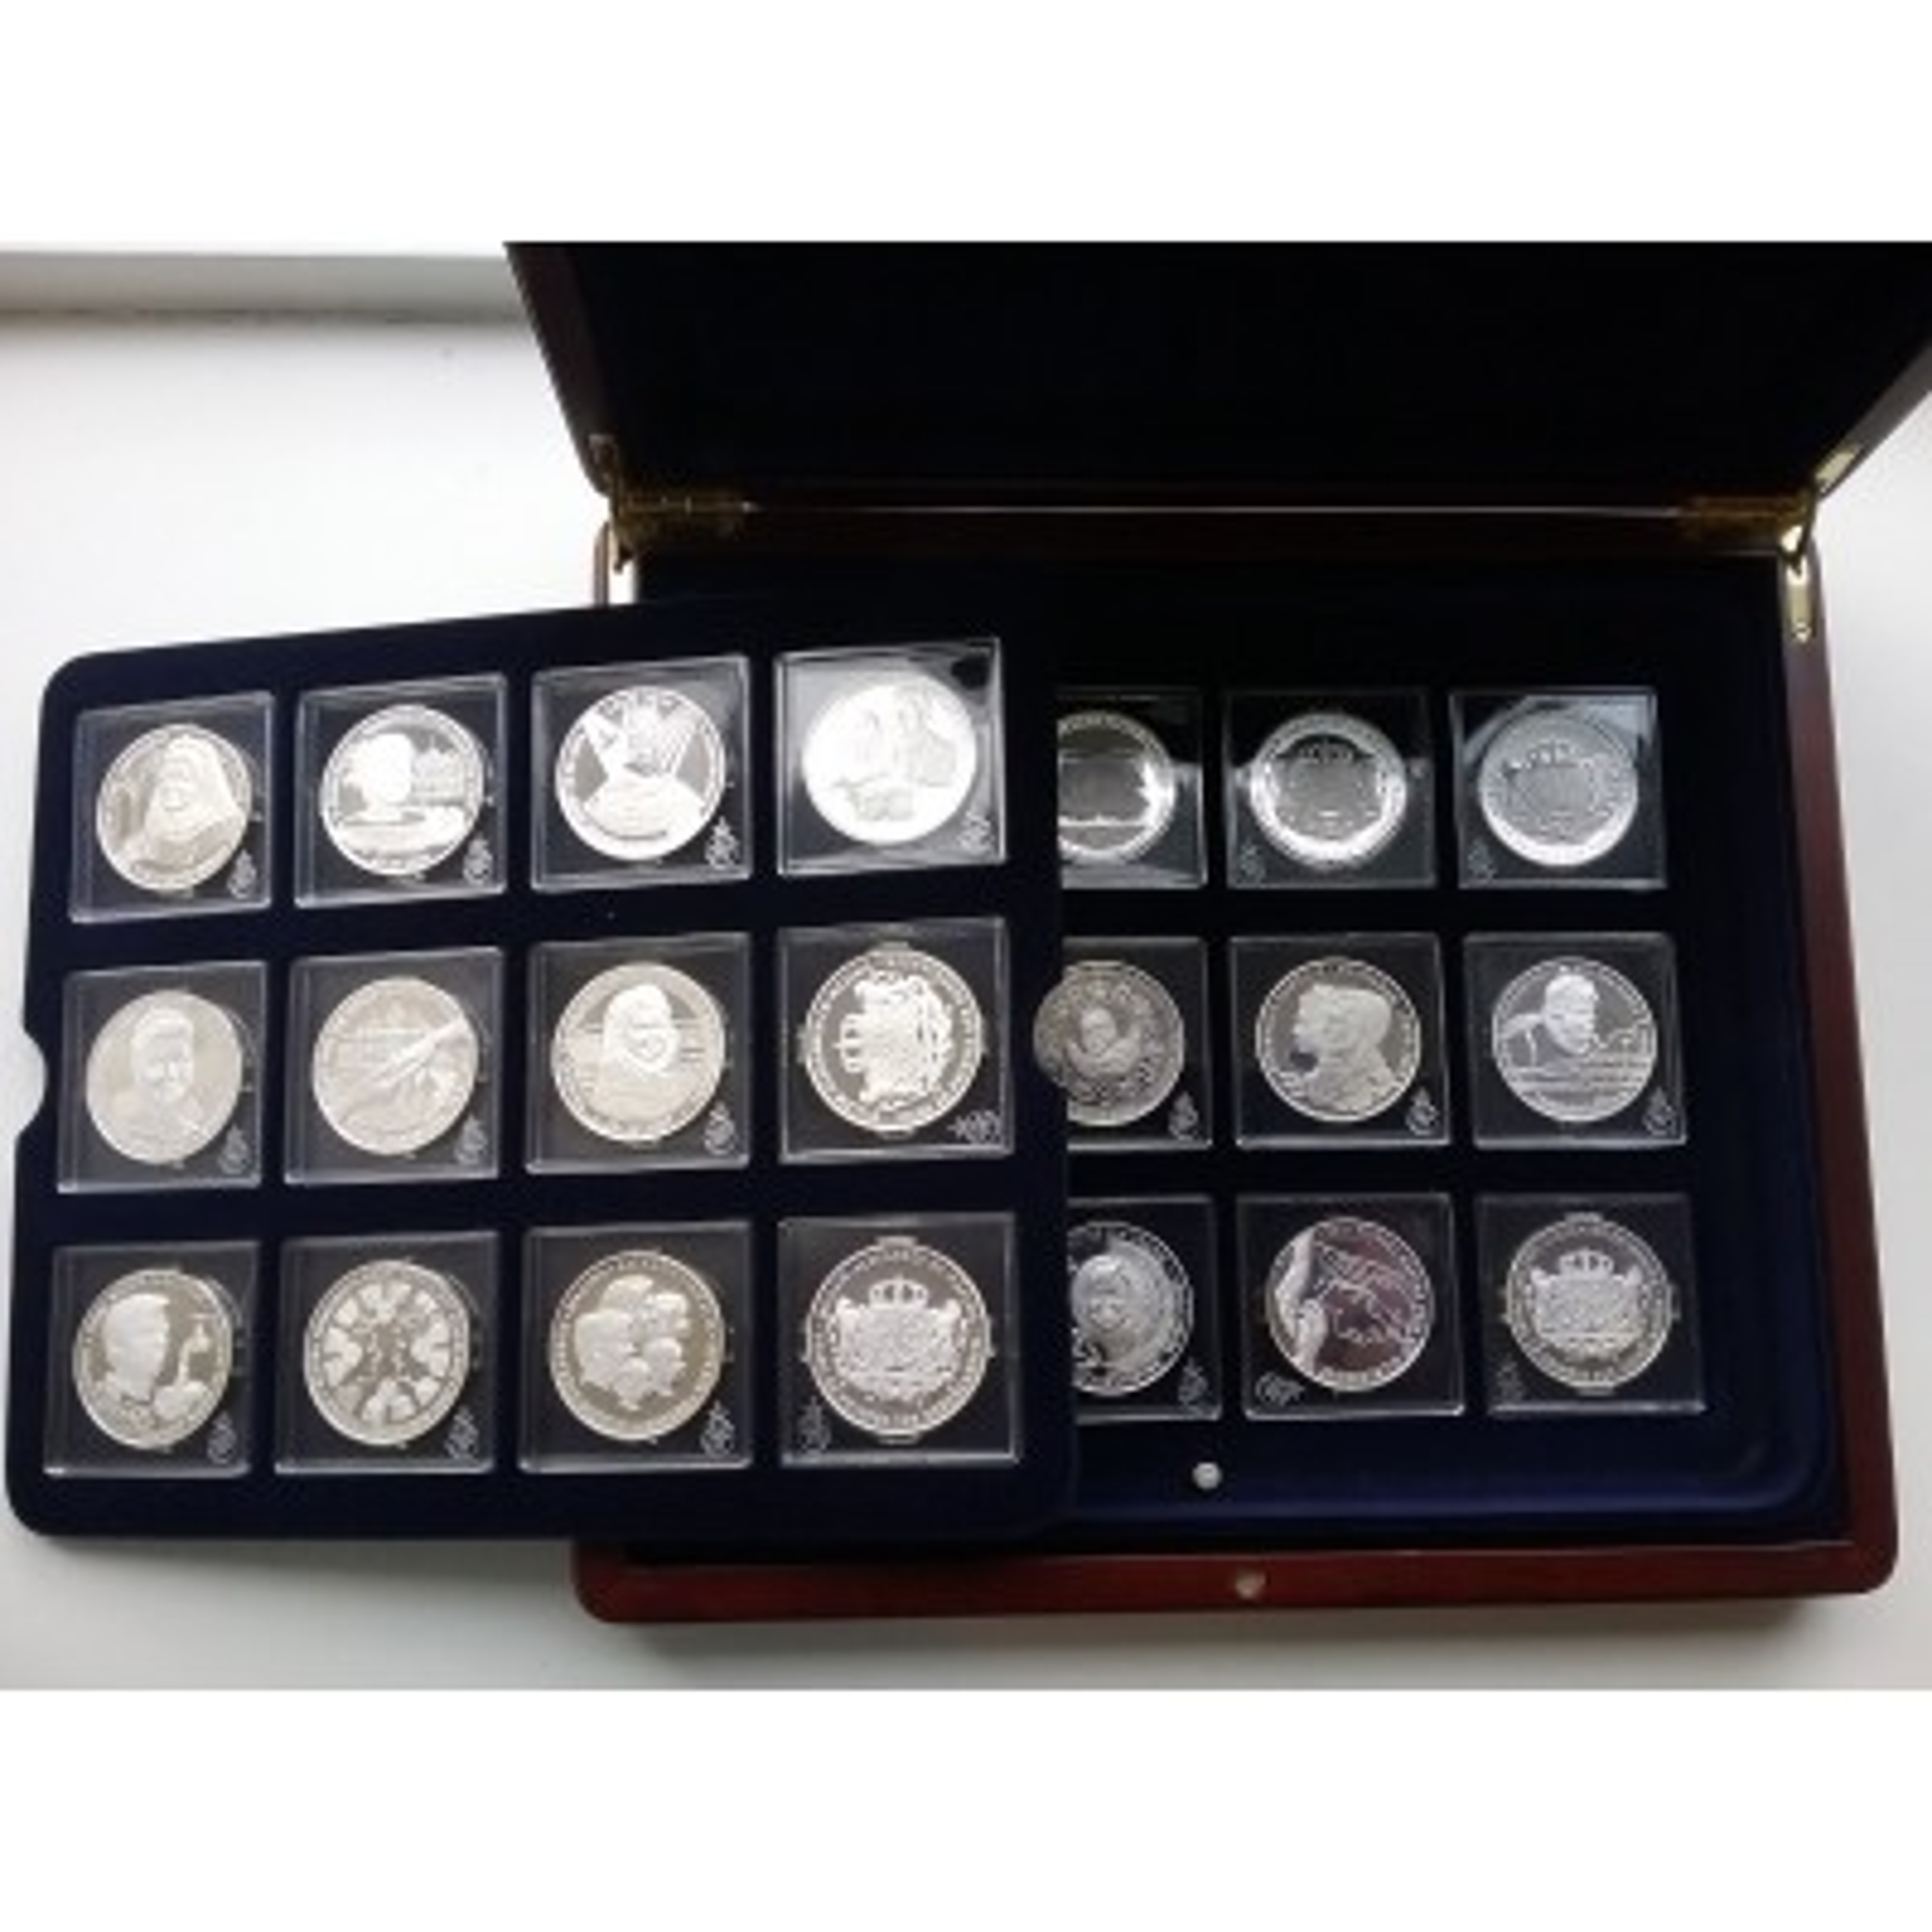 48-Delige zilveren munten set Oranje Naussau